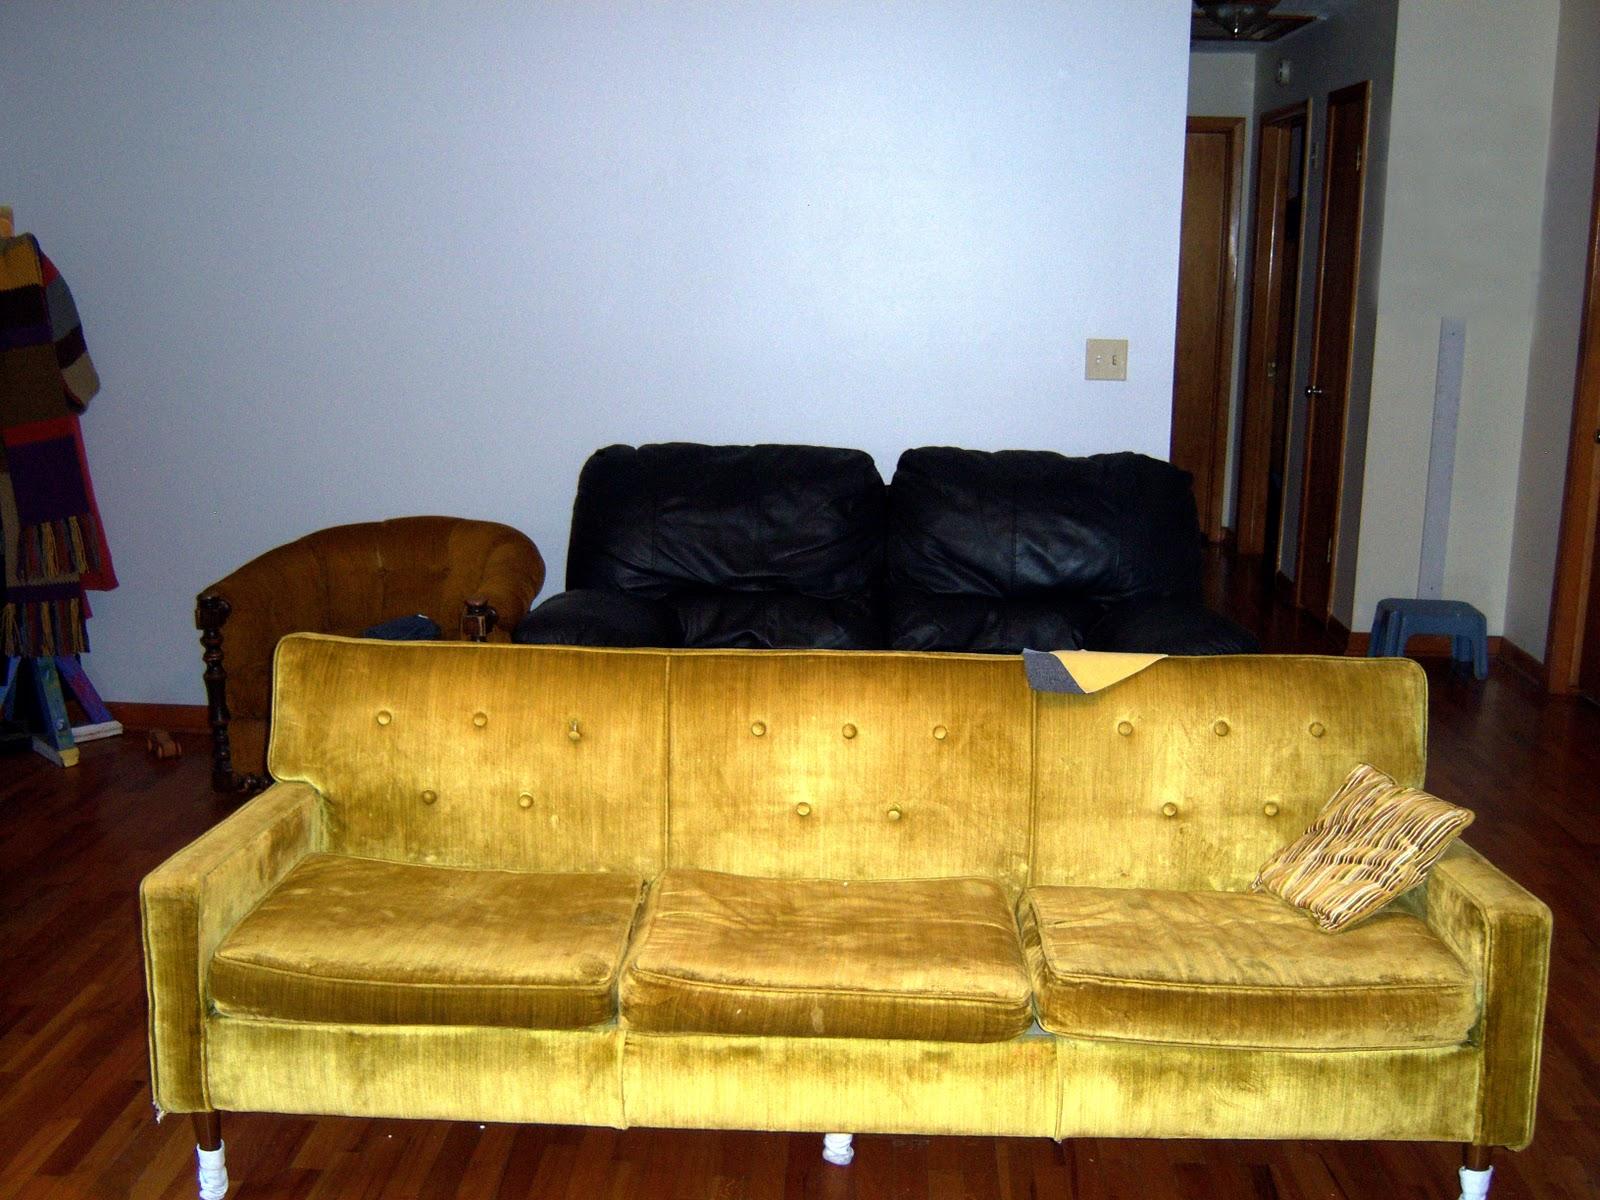 Dichotomy House Gotta love Craigslist furniture